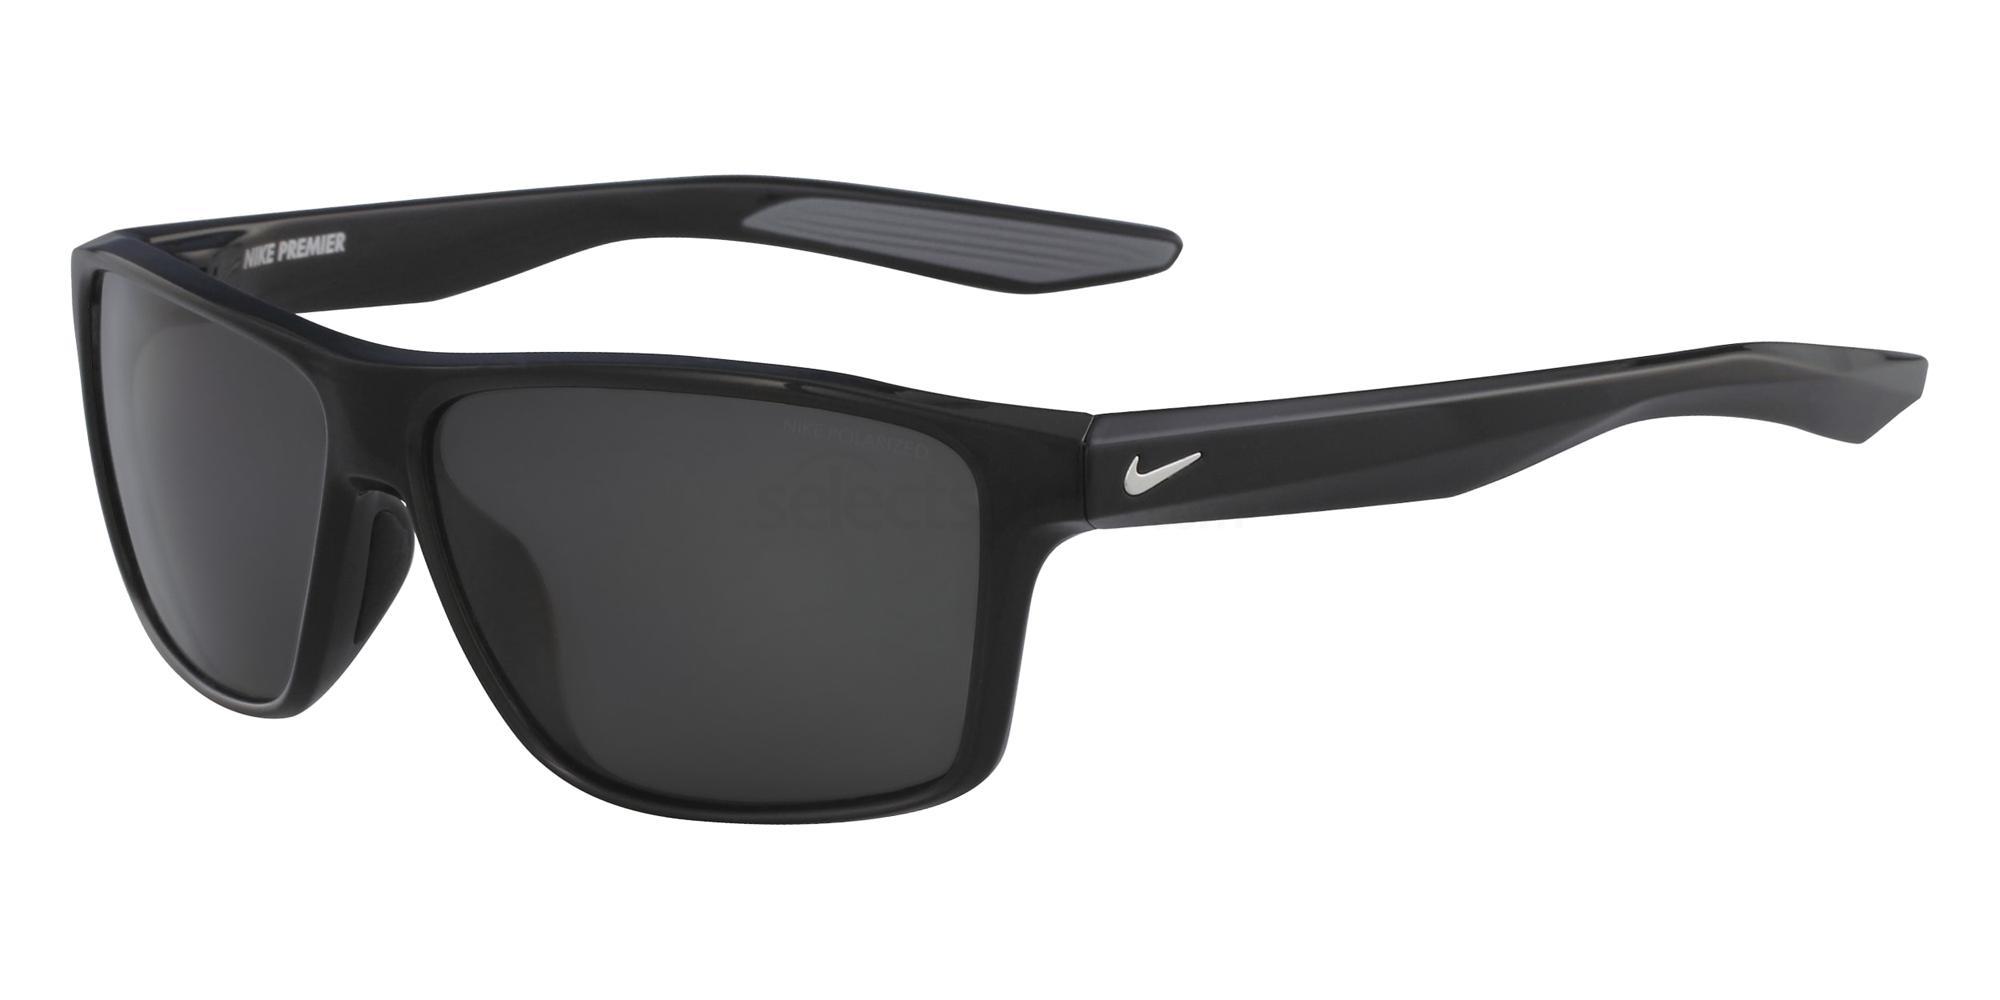 001 PREMIER P EV1073 Sunglasses, Nike